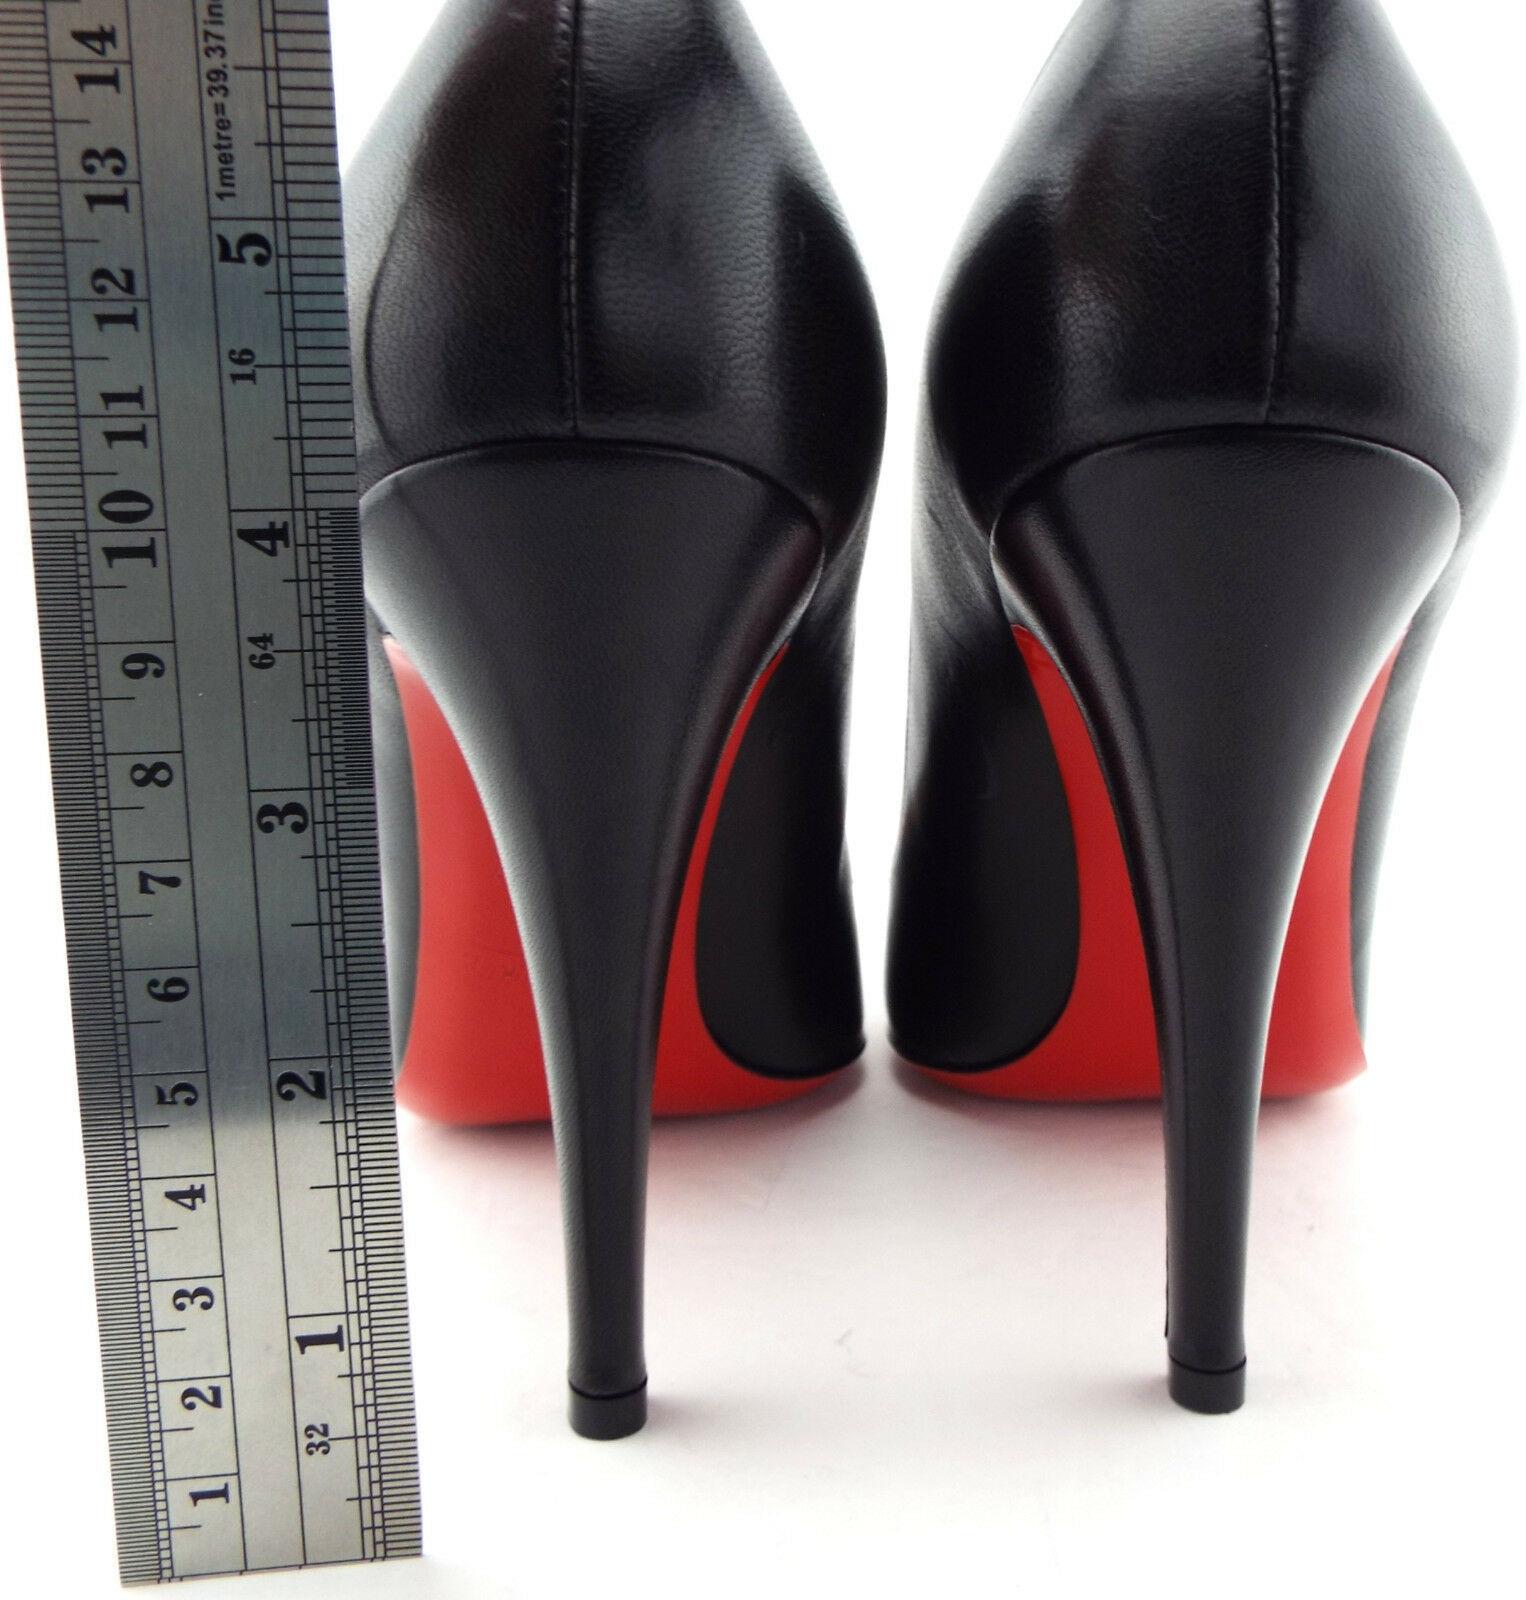 c4080f97b07b New CHRISTIAN LOUBOUTIN Size 8.5 DECOLLETE 868 Heels Pumps Shoes 39